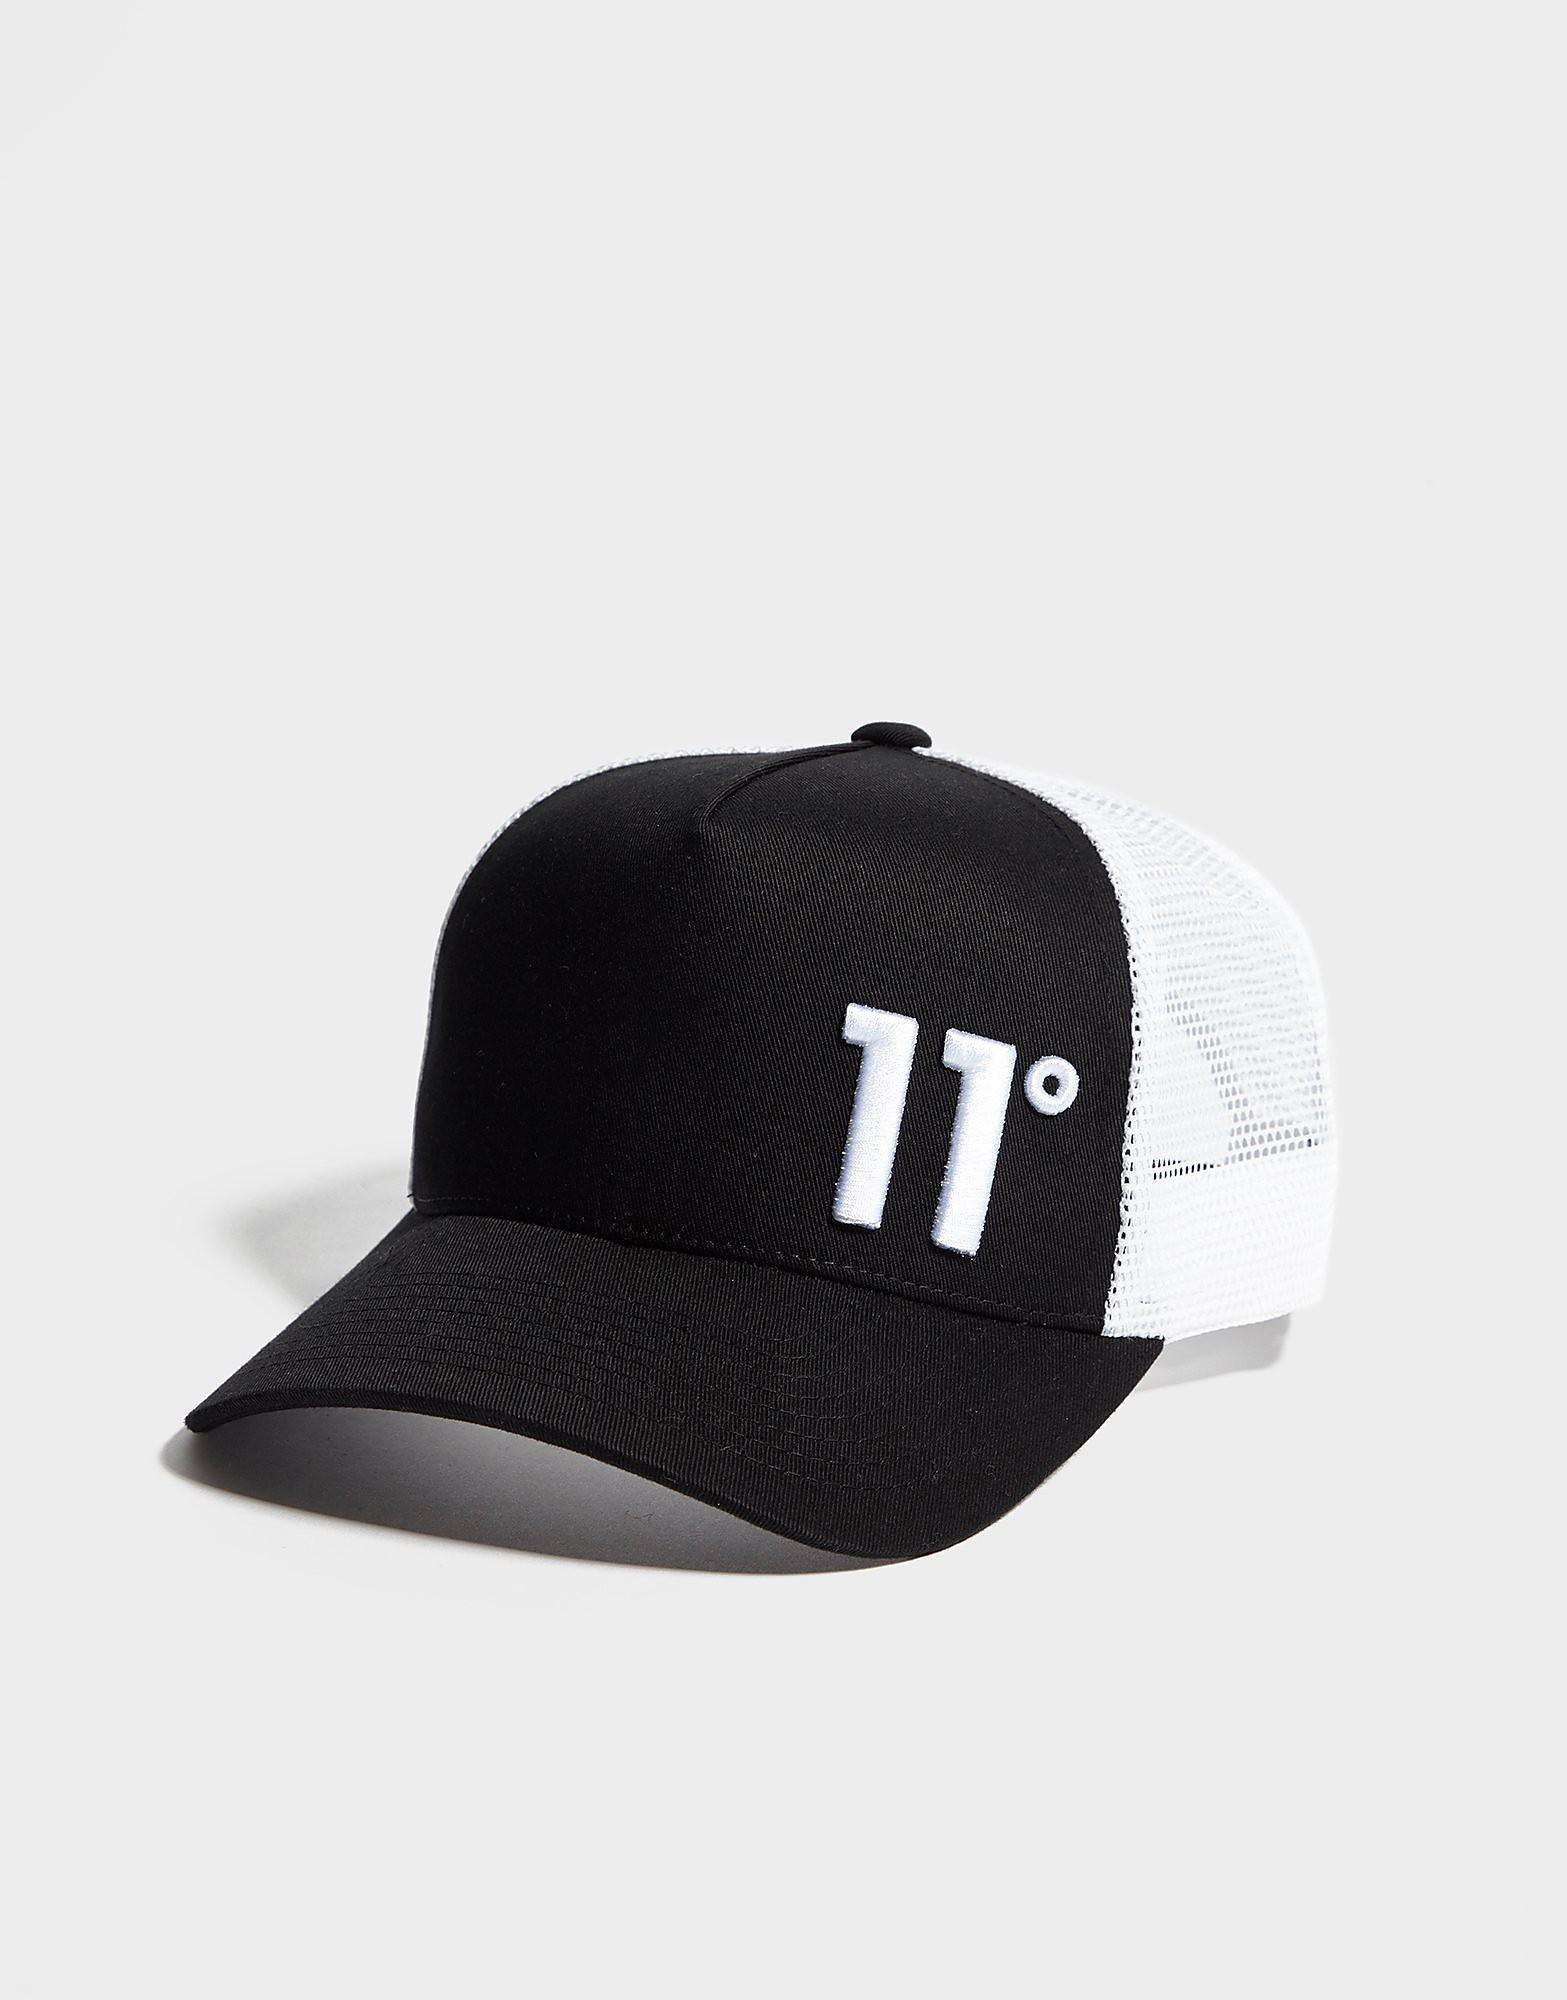 11 Degrees Trucker Cap - Zwart - Heren